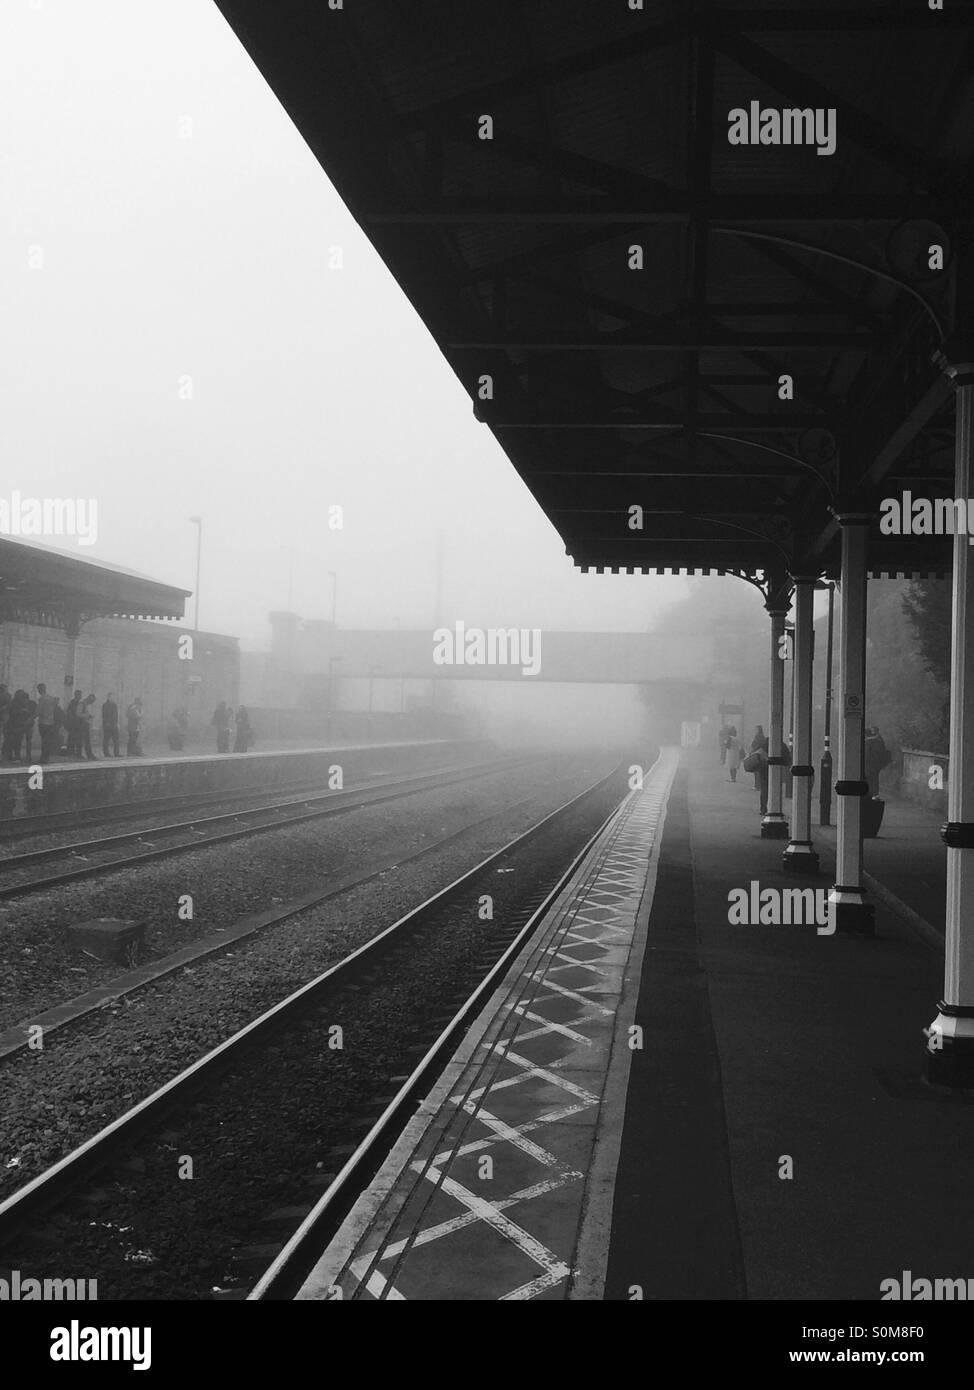 Commuters waiting at Dewsbury train station, West Yorkshire, UK. - Stock Image